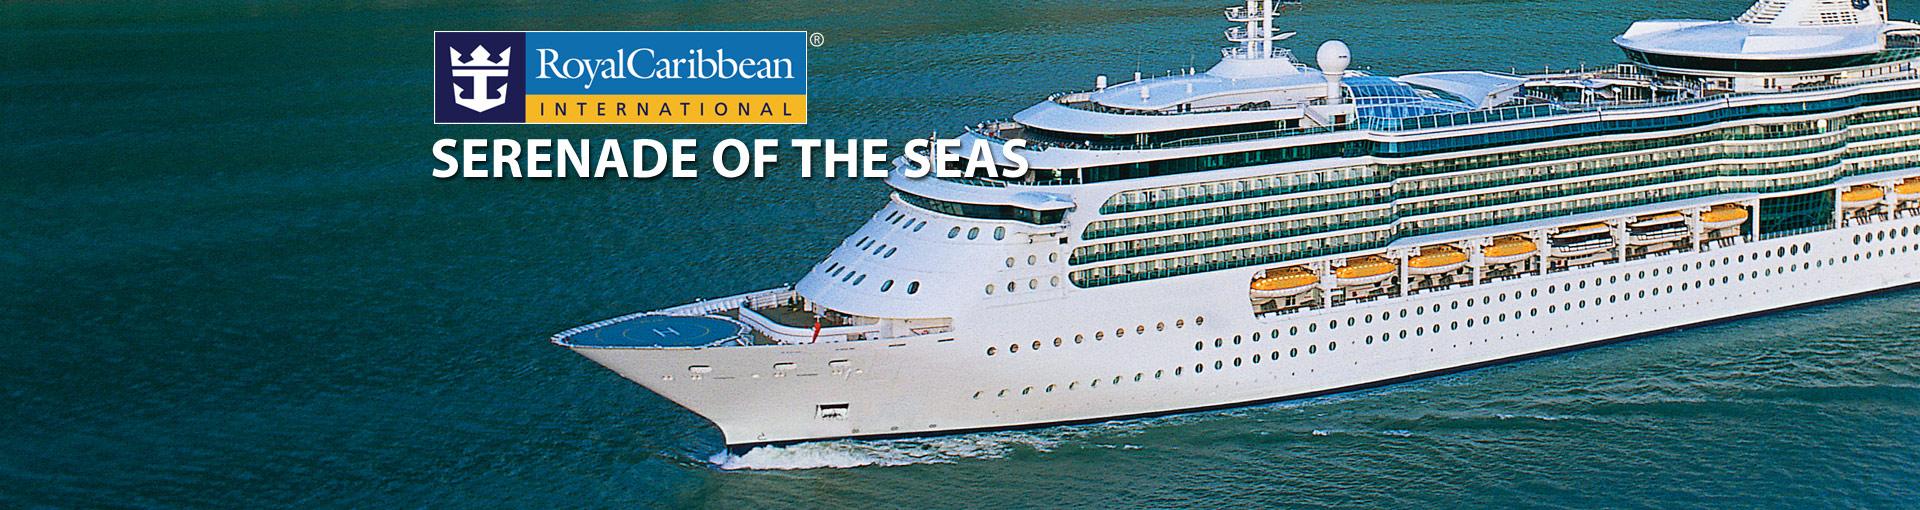 Royal Caribbean Cruise Gift Certificates